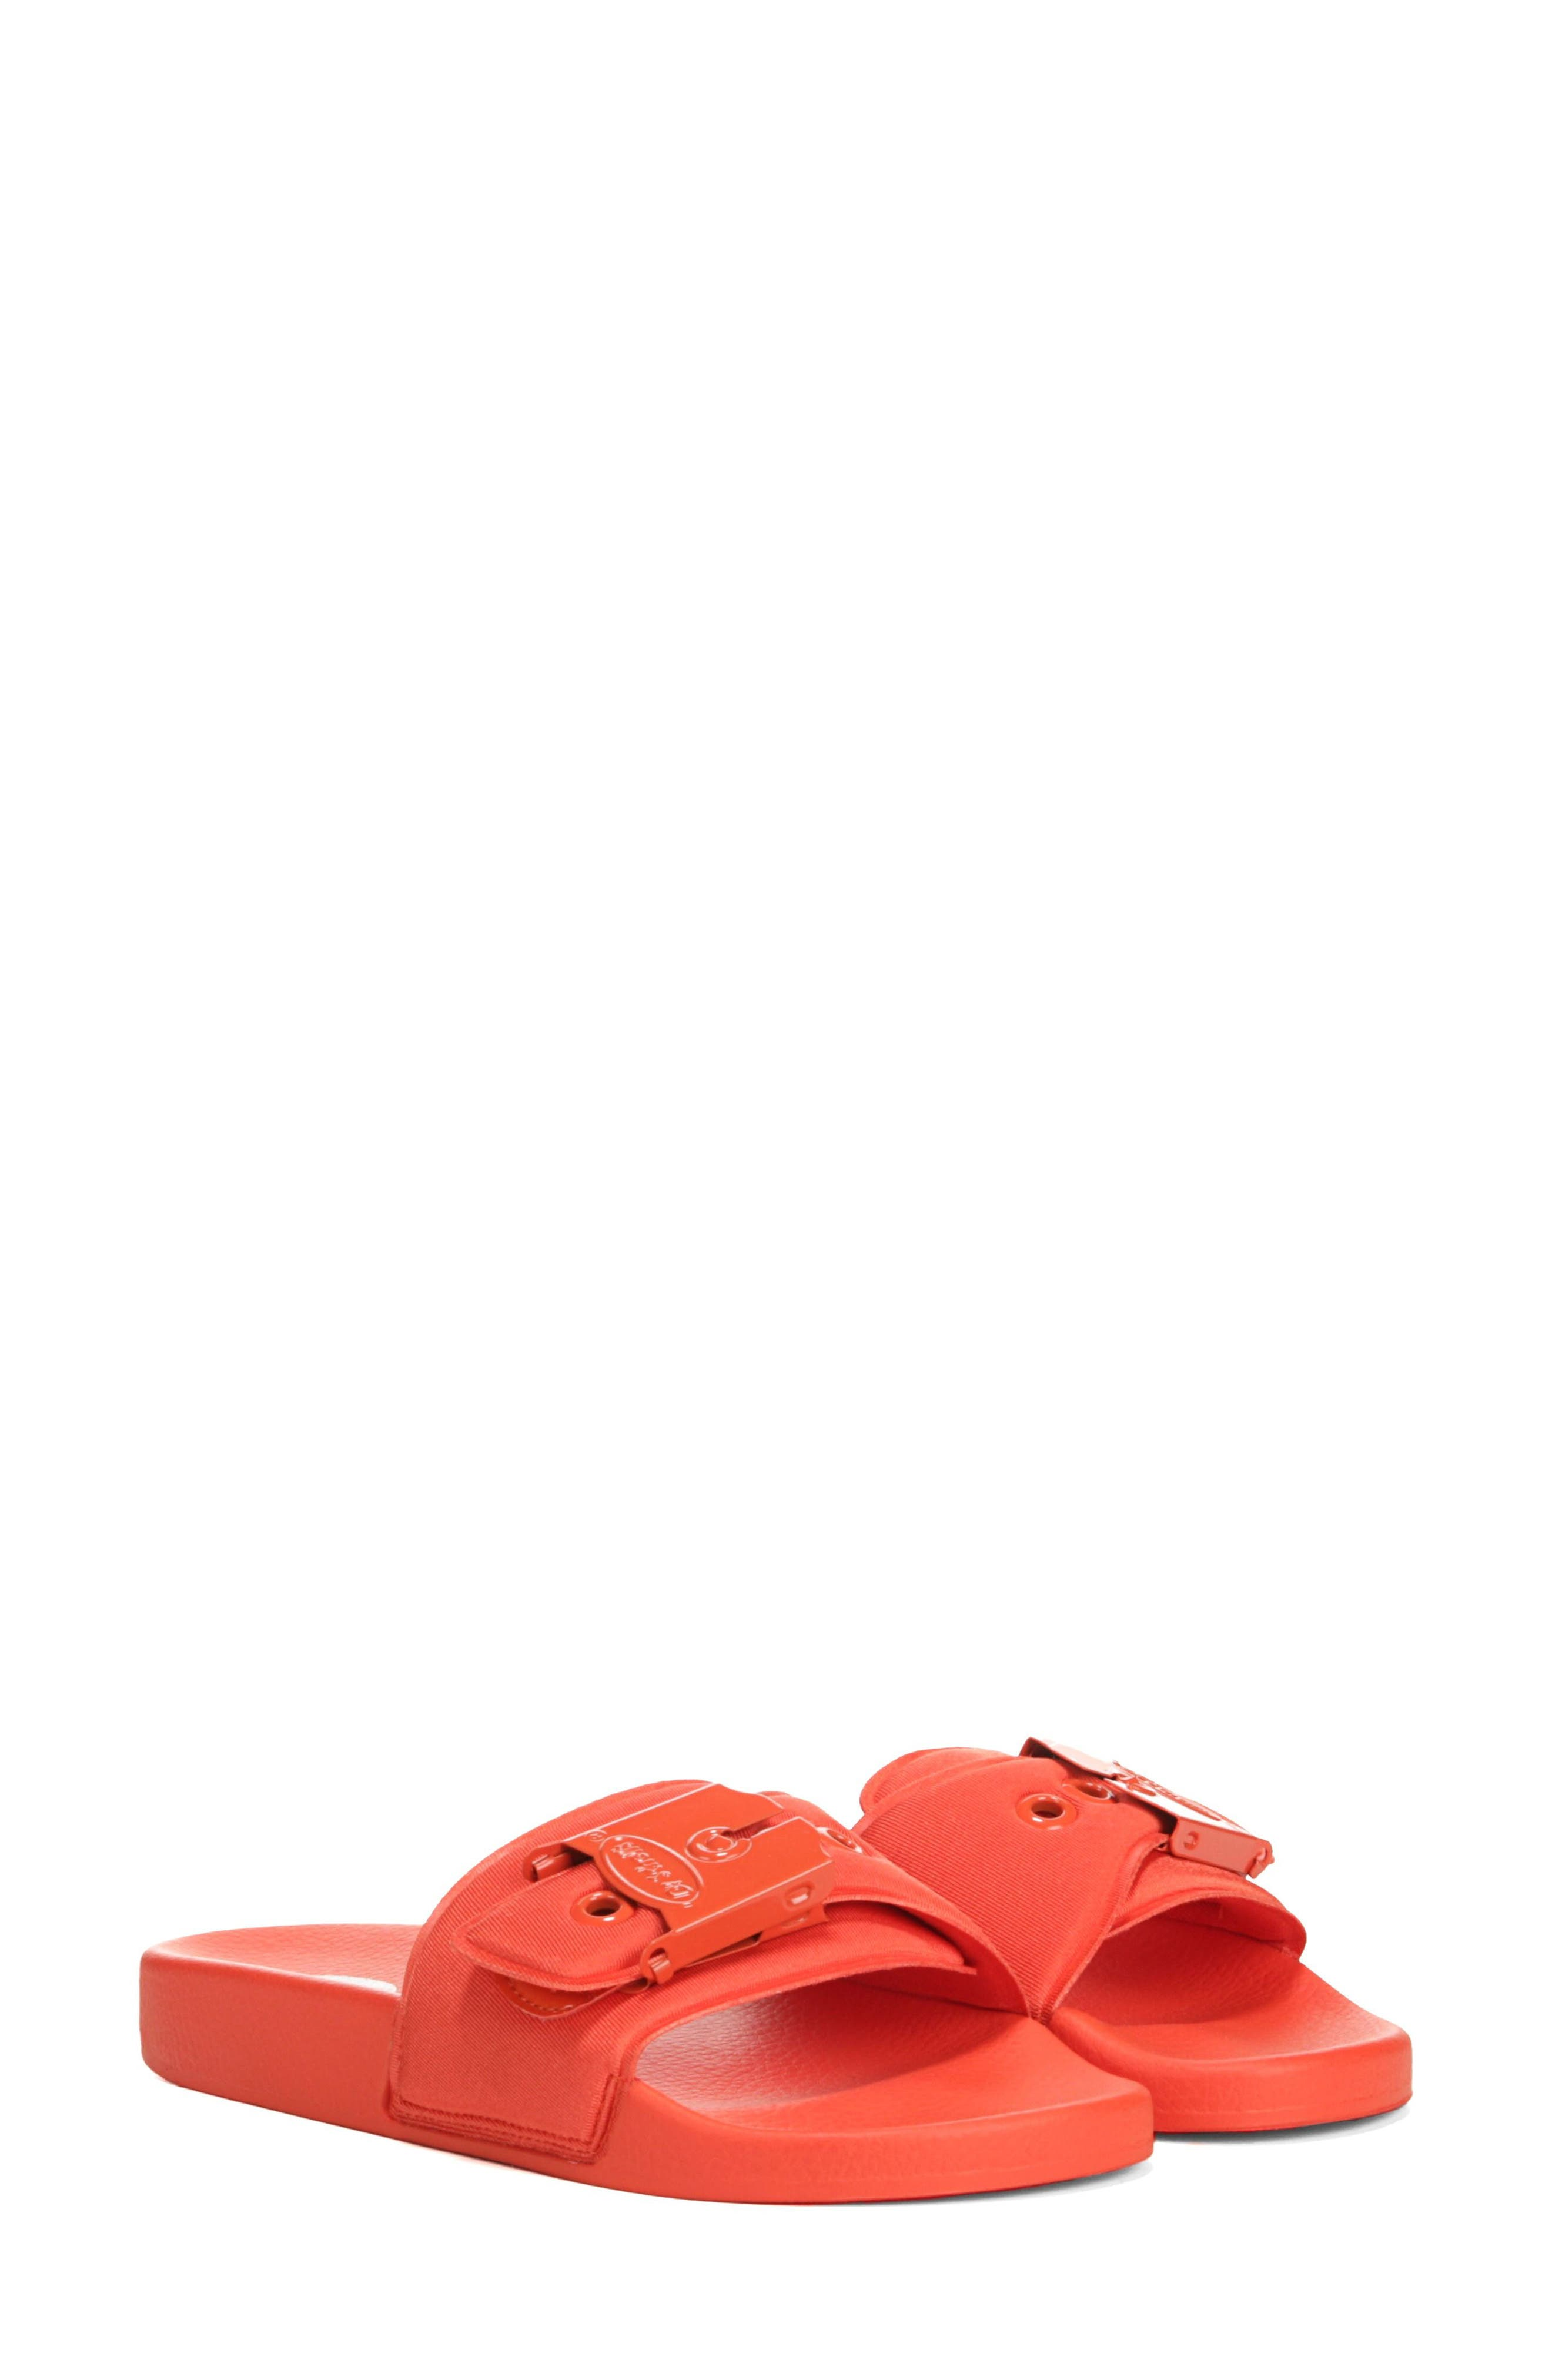 Original Pool Slide Sandal,                             Main thumbnail 1, color,                             TIGER LILY